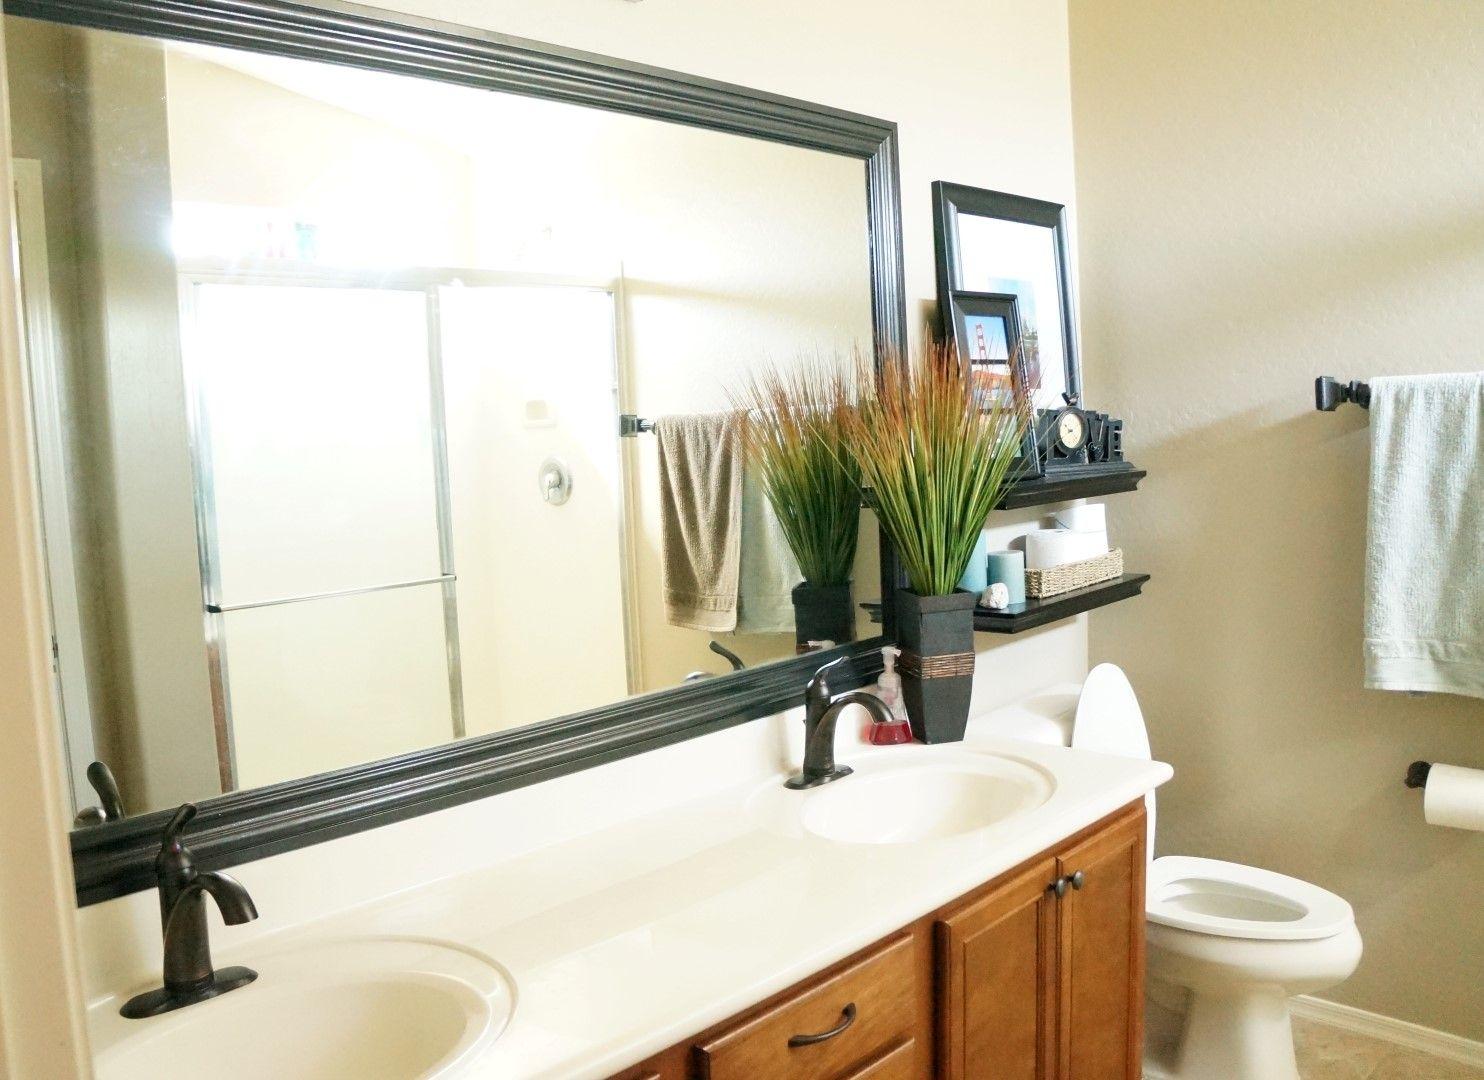 How to Frame a Mirror – DIY Bathroom Mirror Frames Tutorial ...